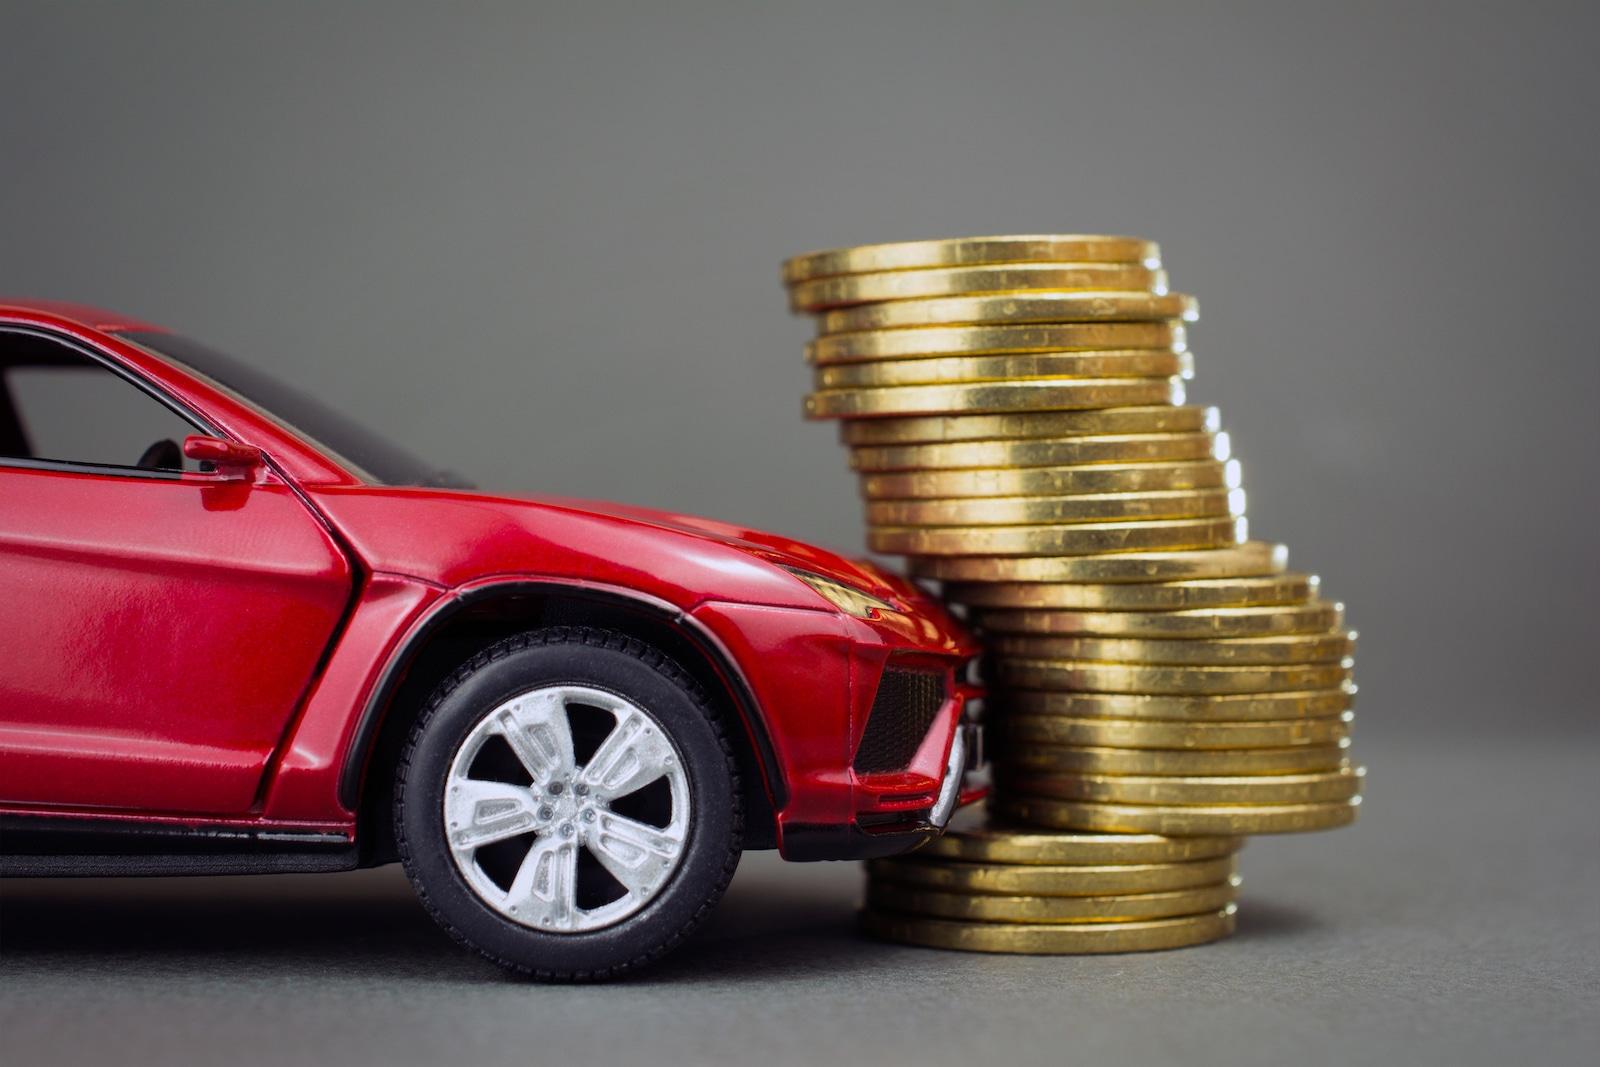 Cheap Car Insurance, No Deposit: Get Low-Cost Full ...